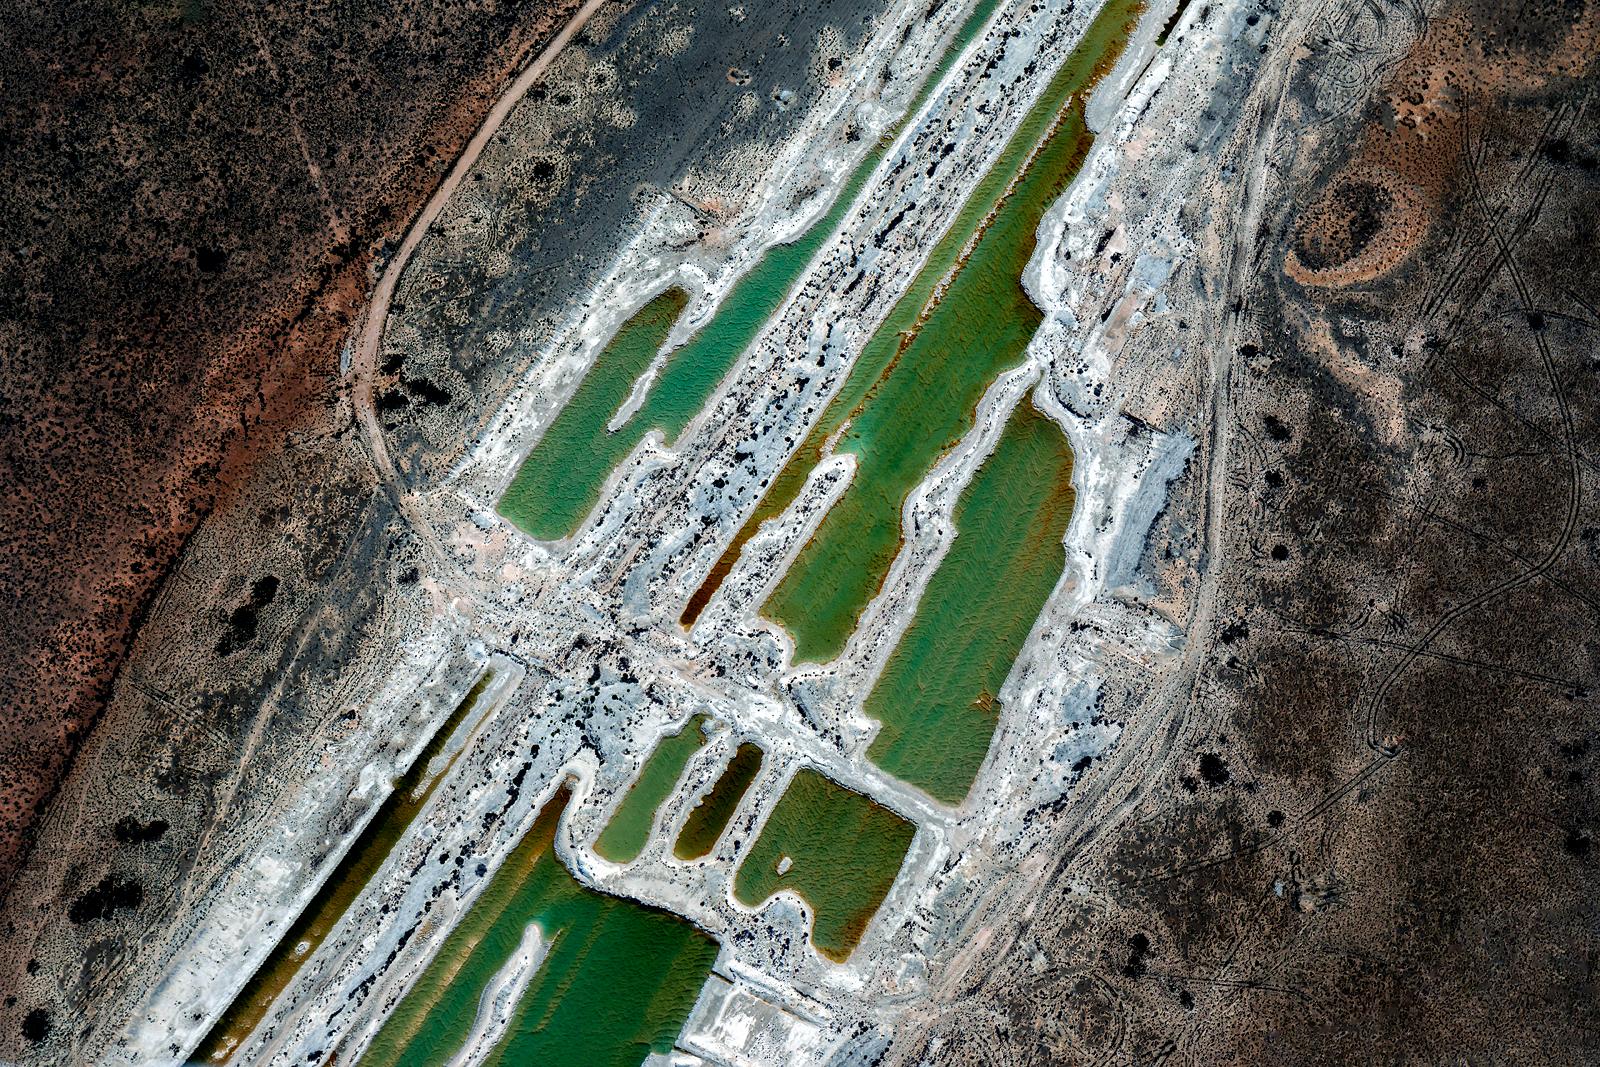 Useless Loop Aerial #19, Shark Bay WA